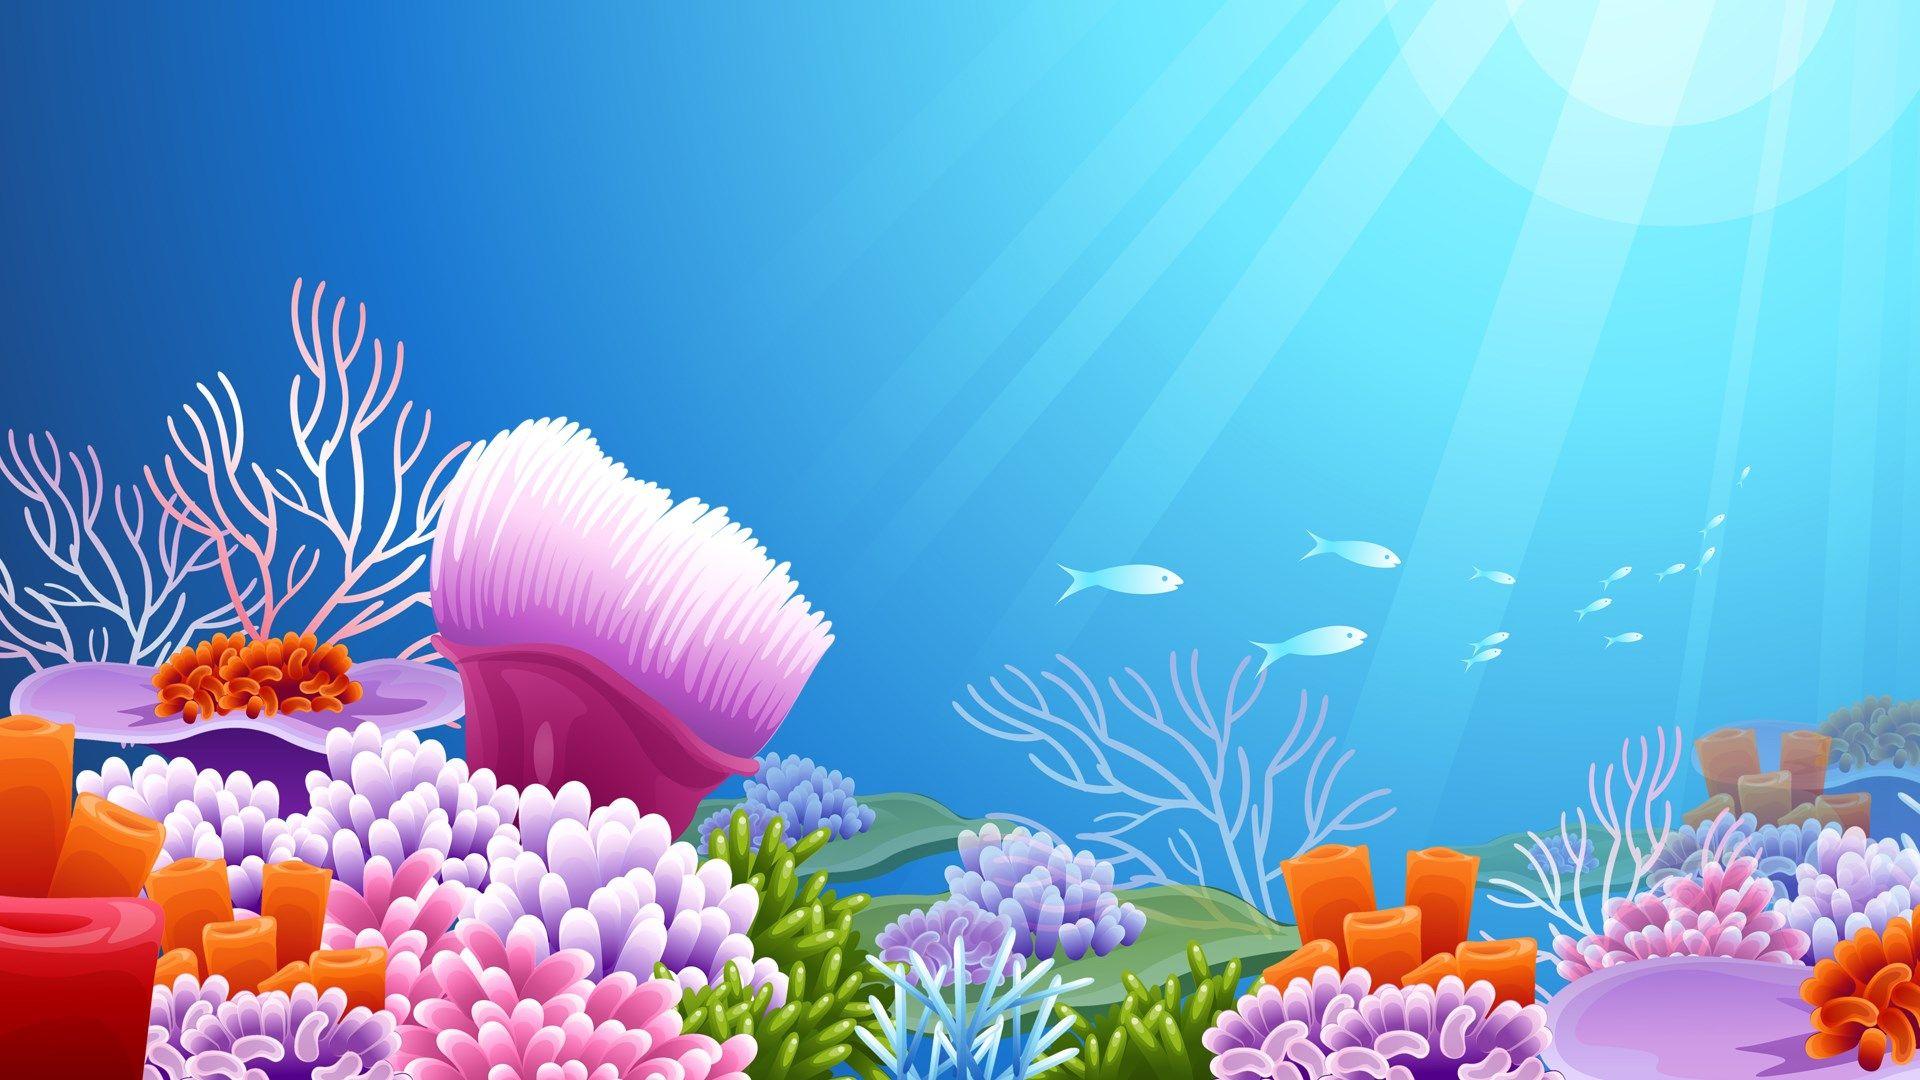 1920x1080 Underwater Free Computer Wallpaper Jpg 298 Kb Aquarium Backgrounds Galaxy Painting Wallpaper